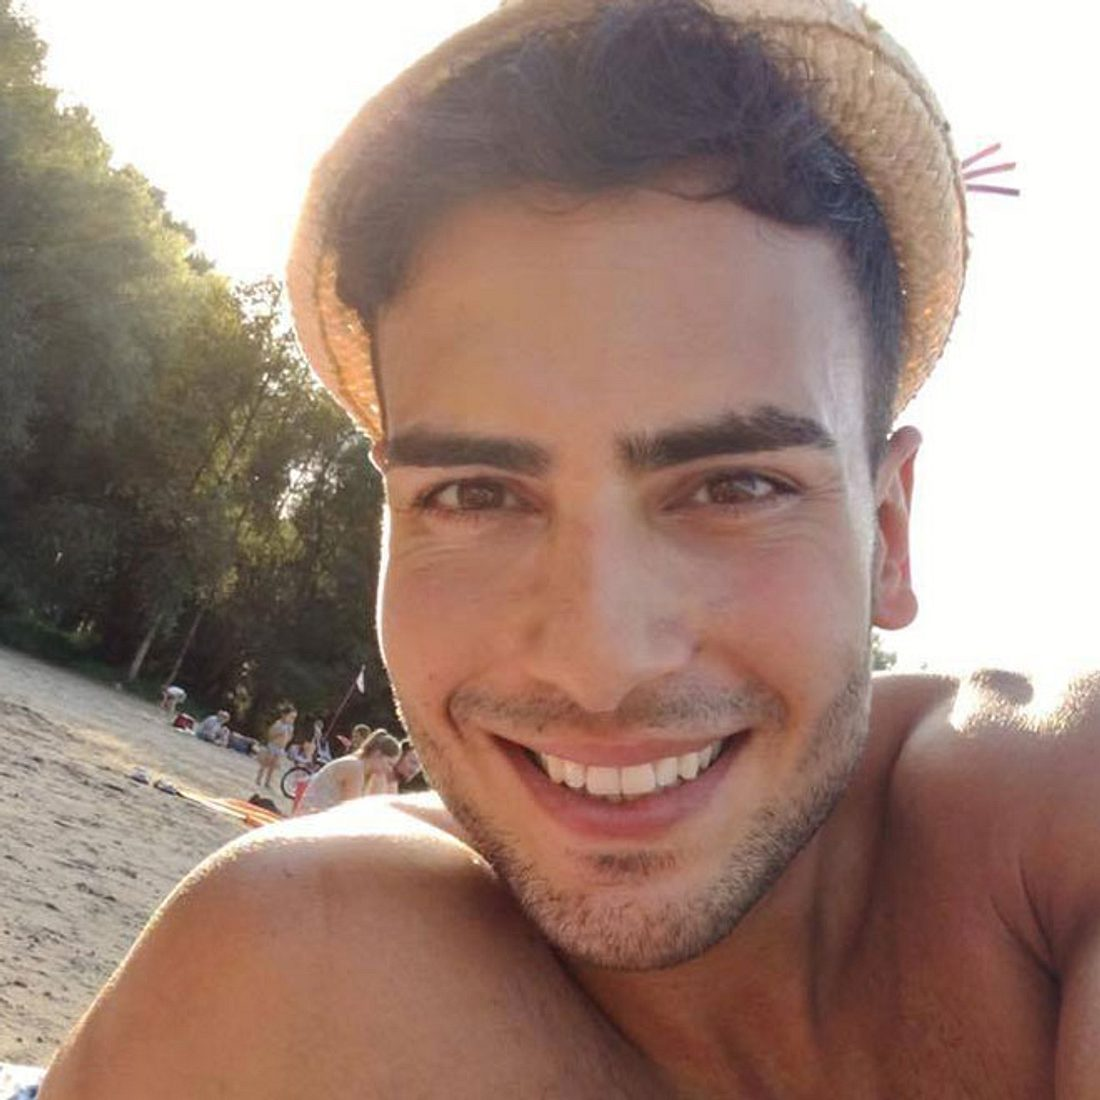 Adam sucht Eva: RTL II-Star Timur Ülker ist offiziell dabei!